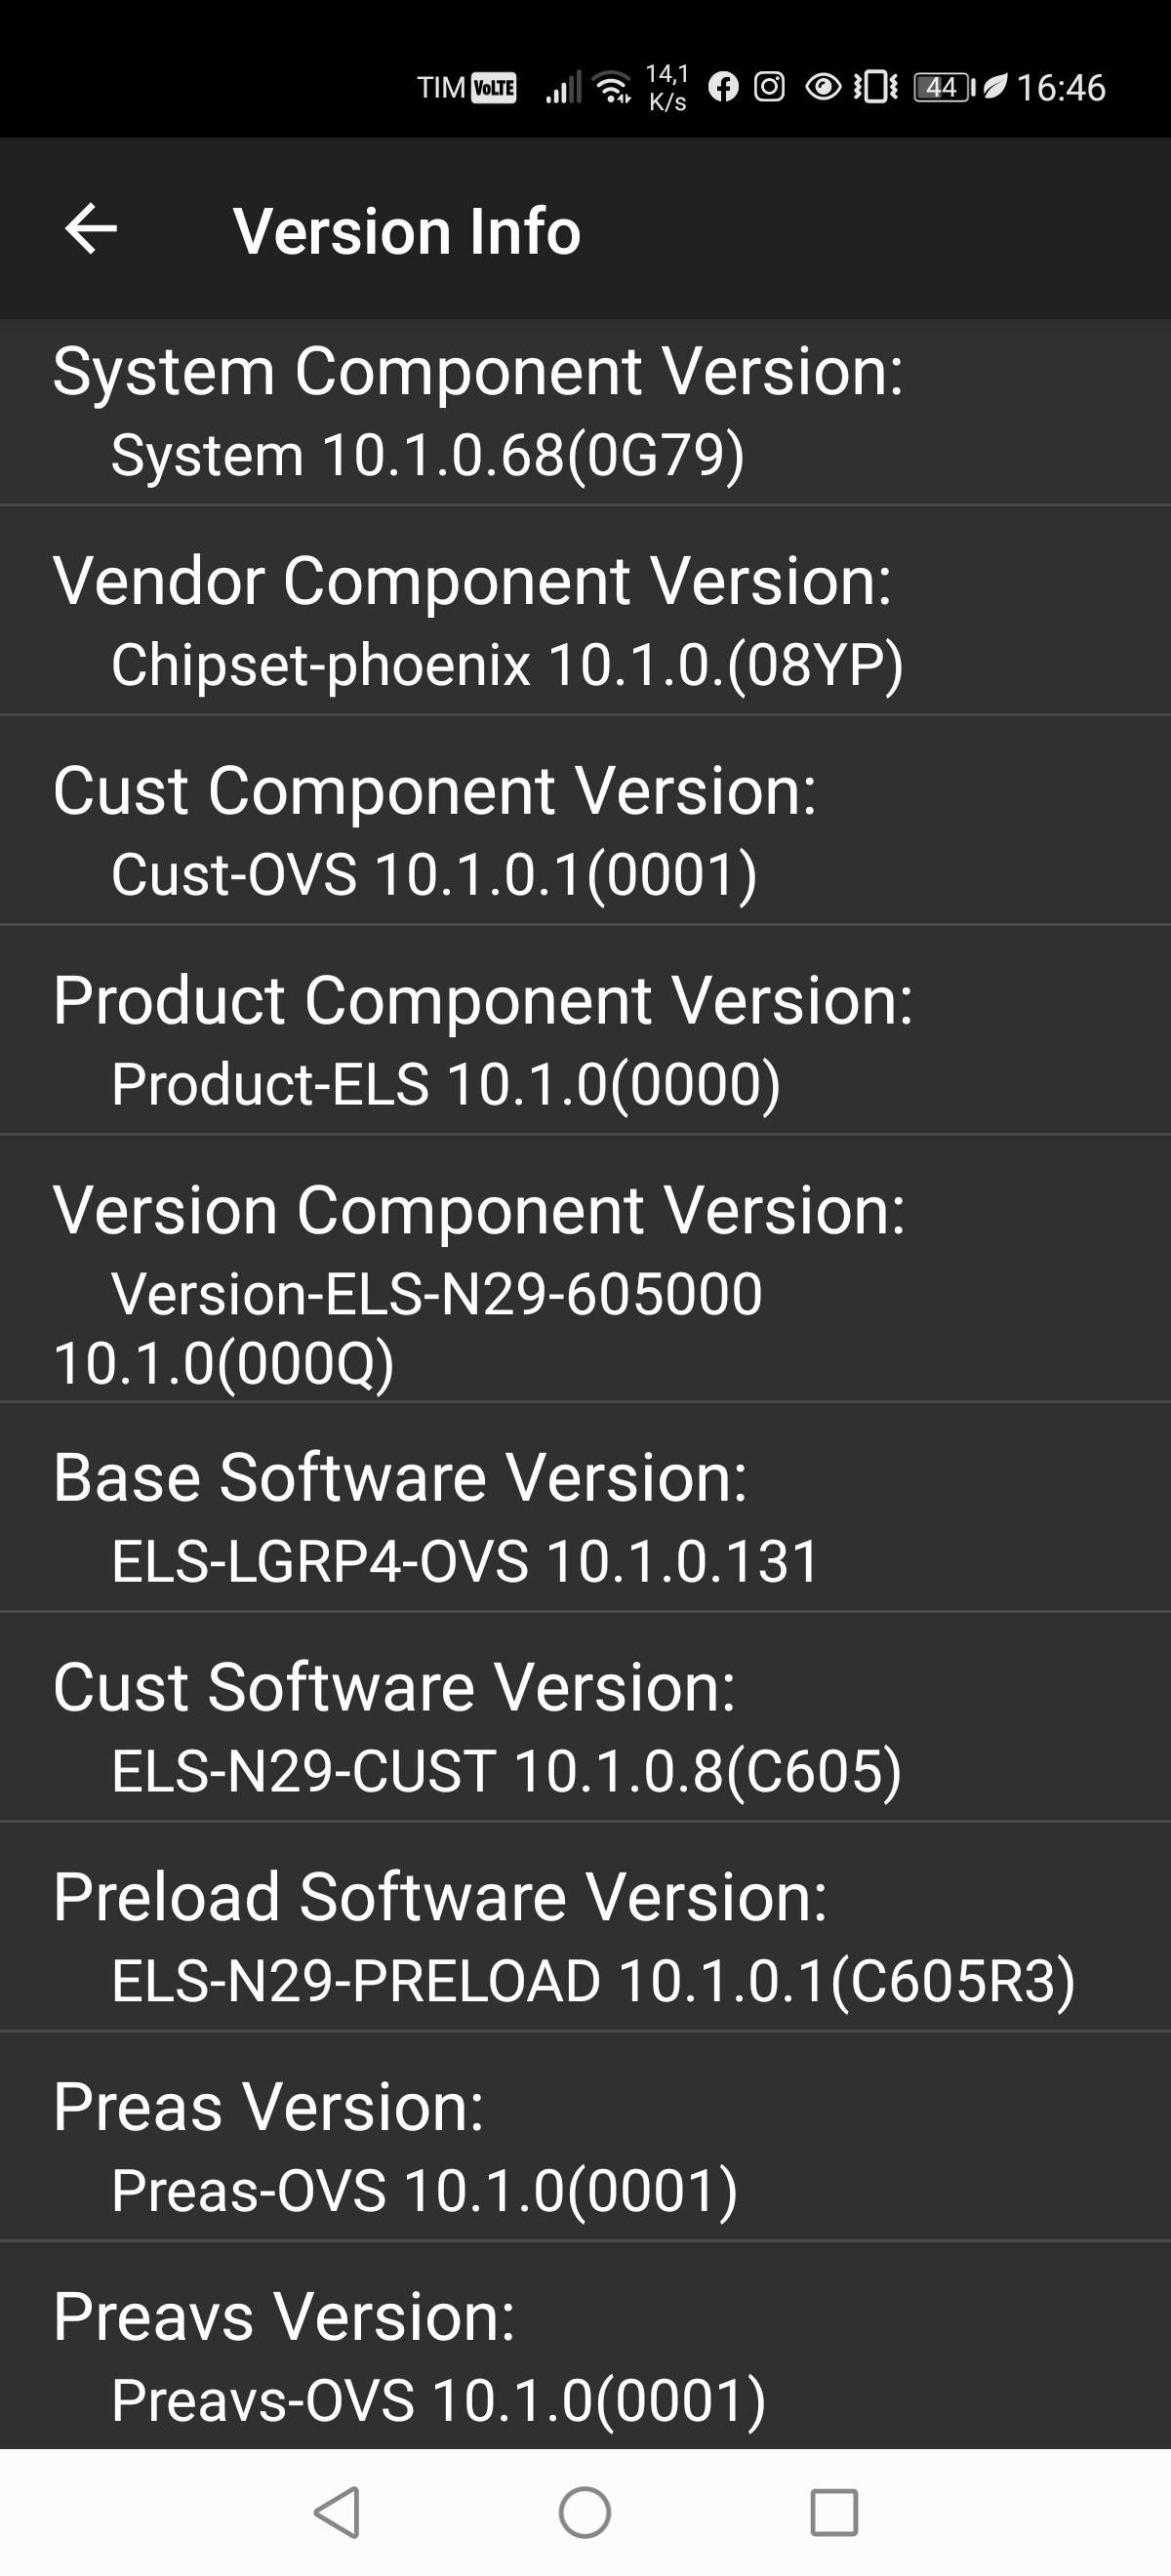 Screenshot_20210616_164632_com.huawei.android.projectmenu.jpg